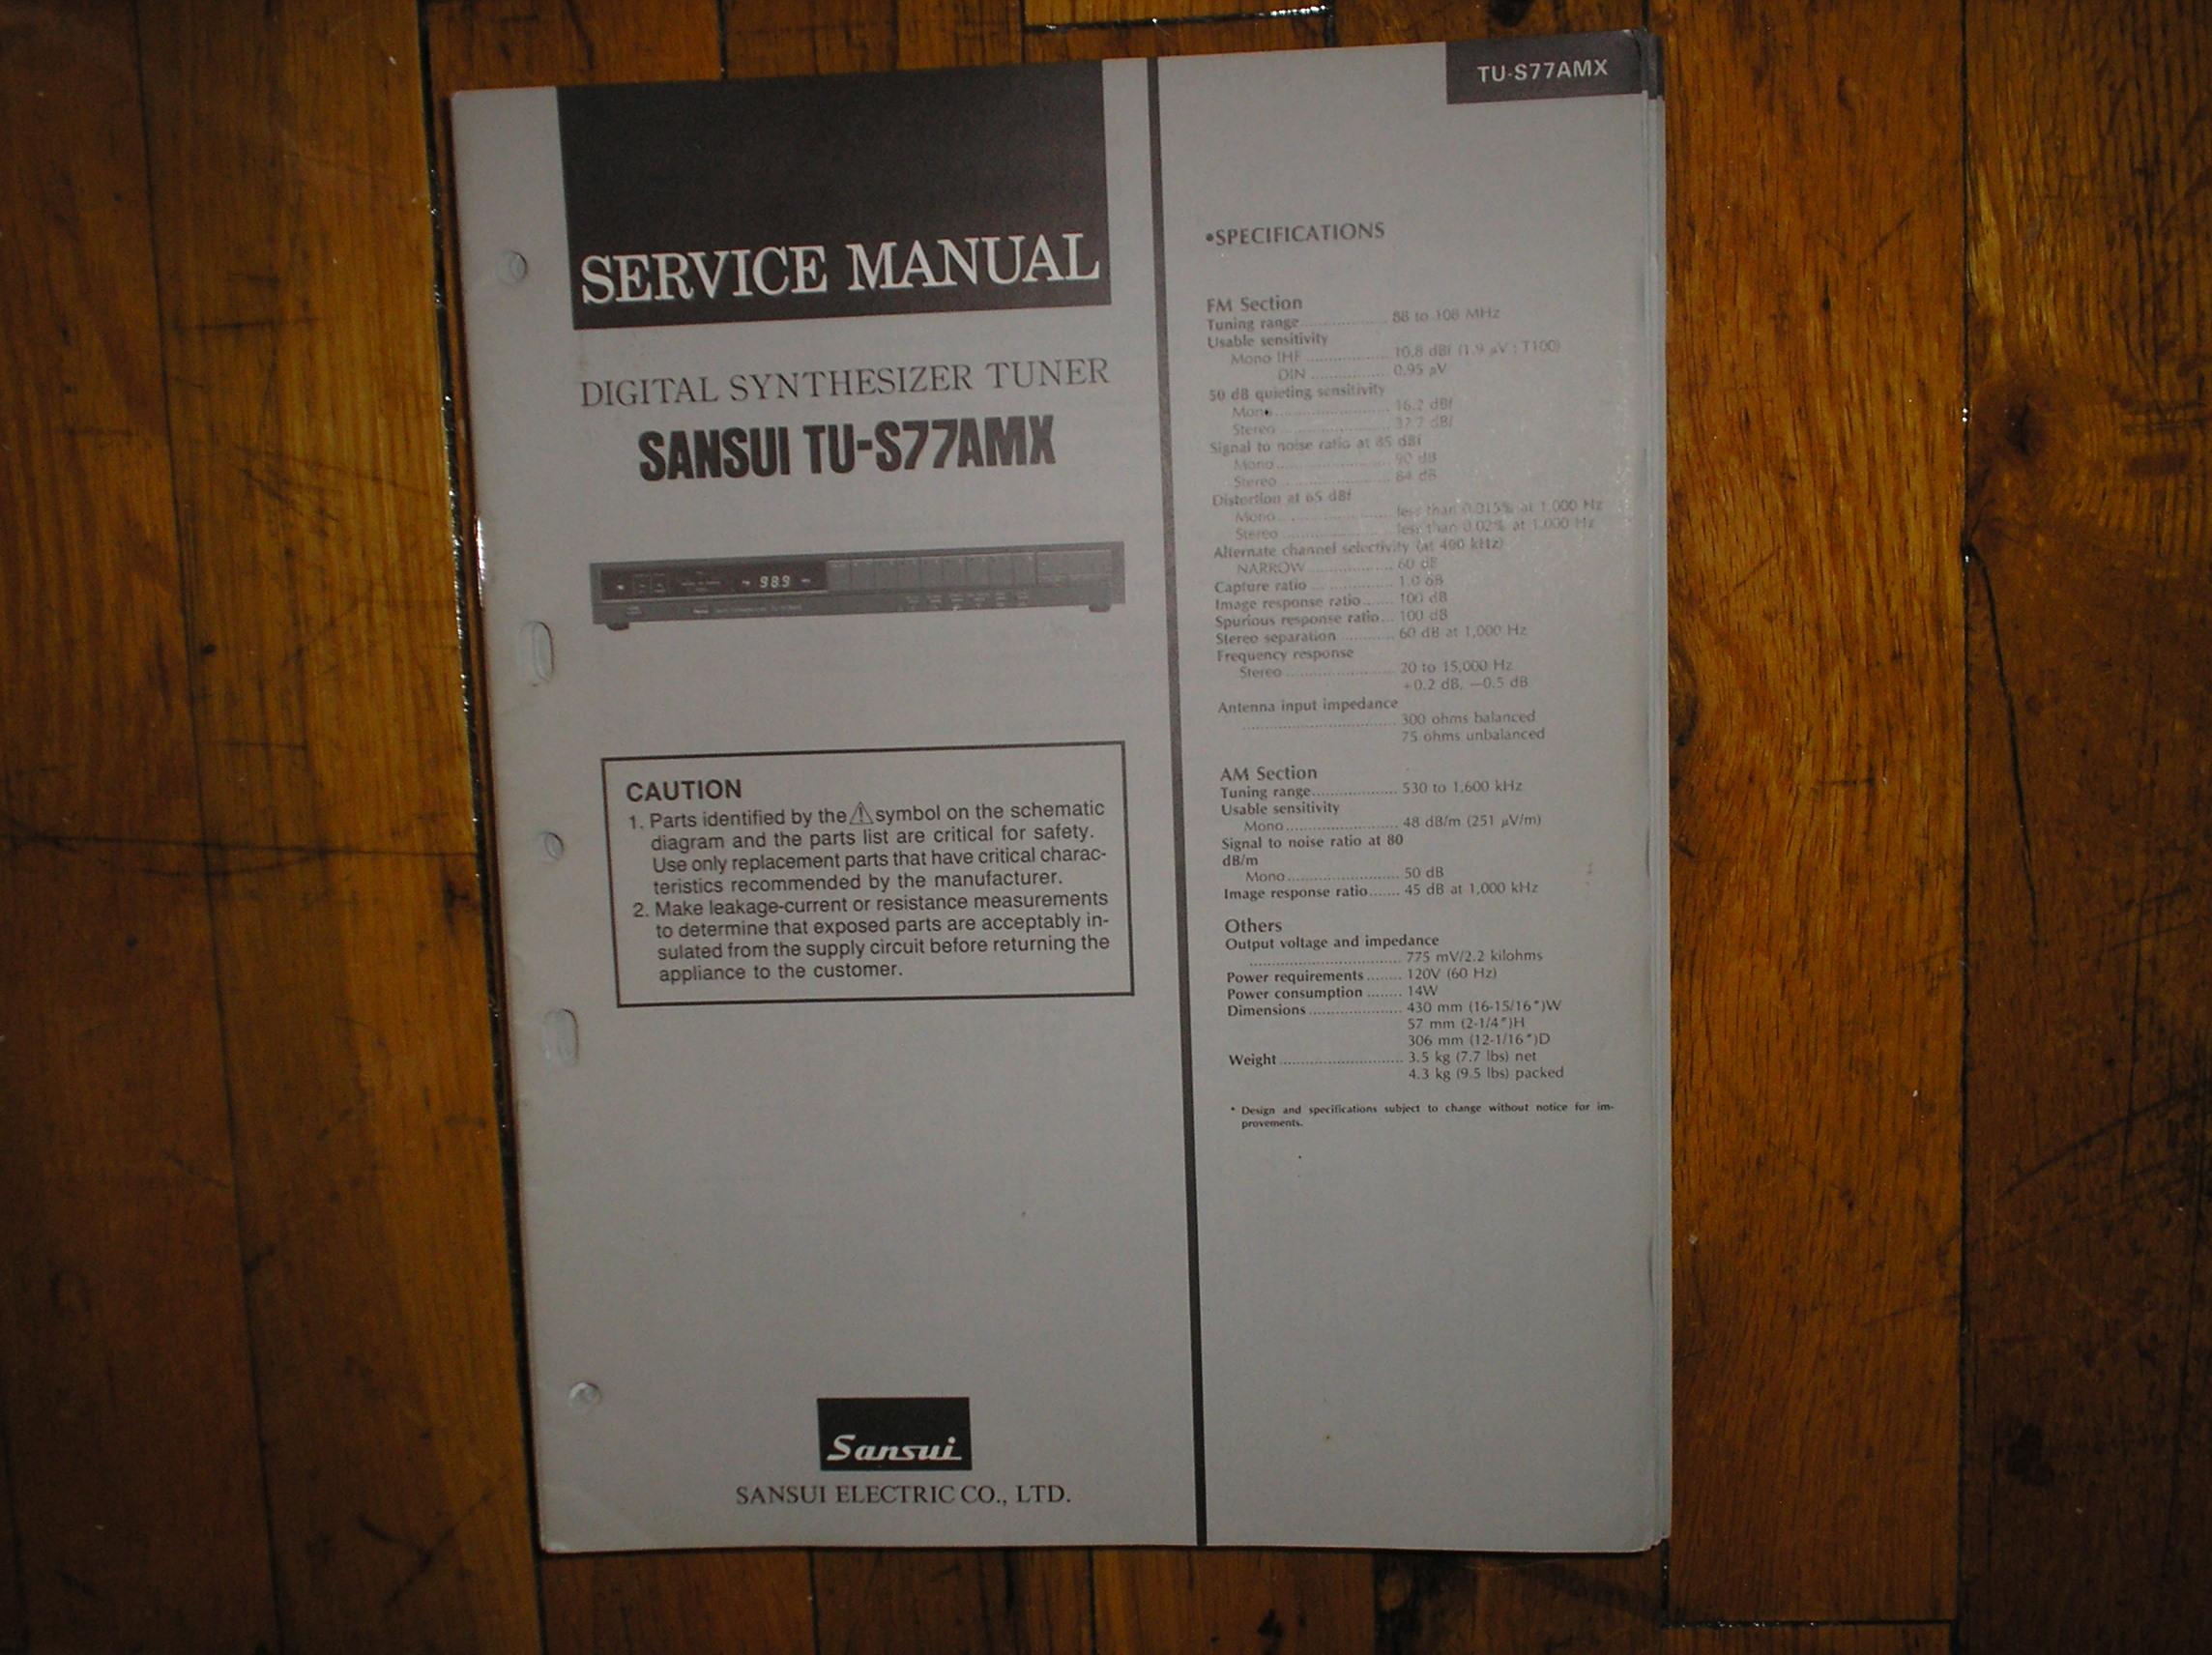 TU-S77AMX Tuner Service Manual